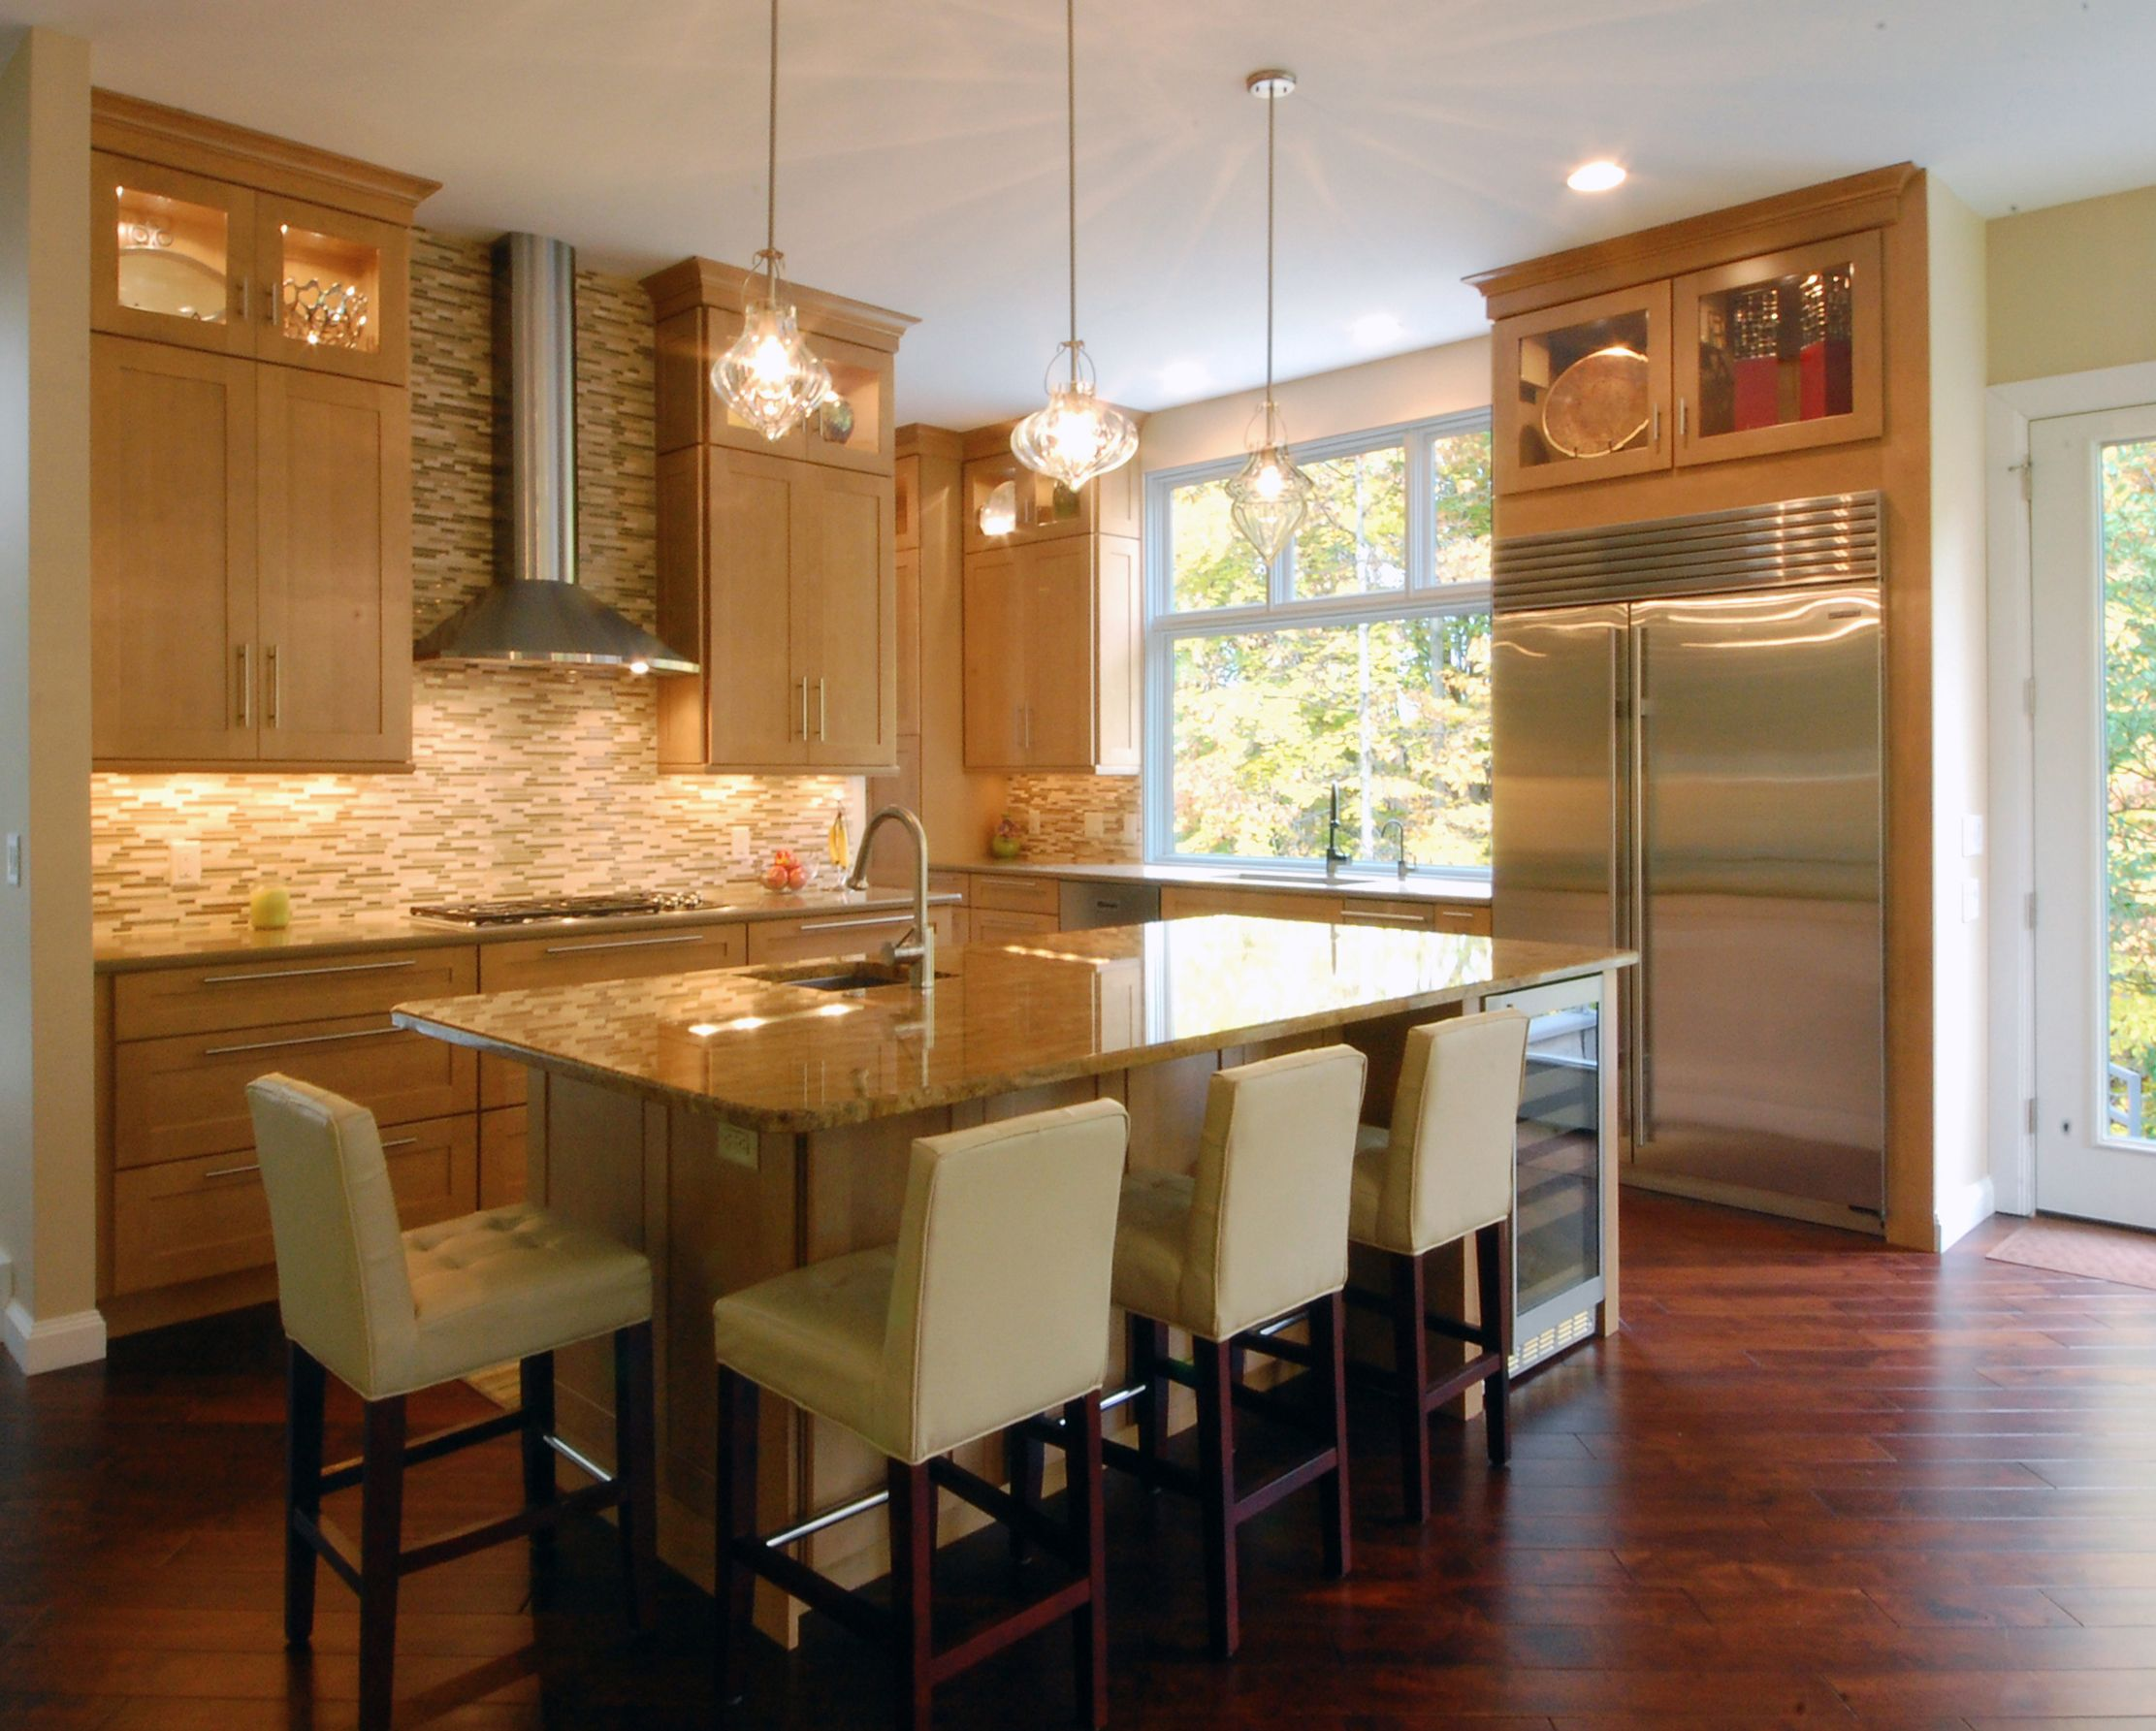 Bentleyville kitchen with maple cabinets, hardwood floors ...